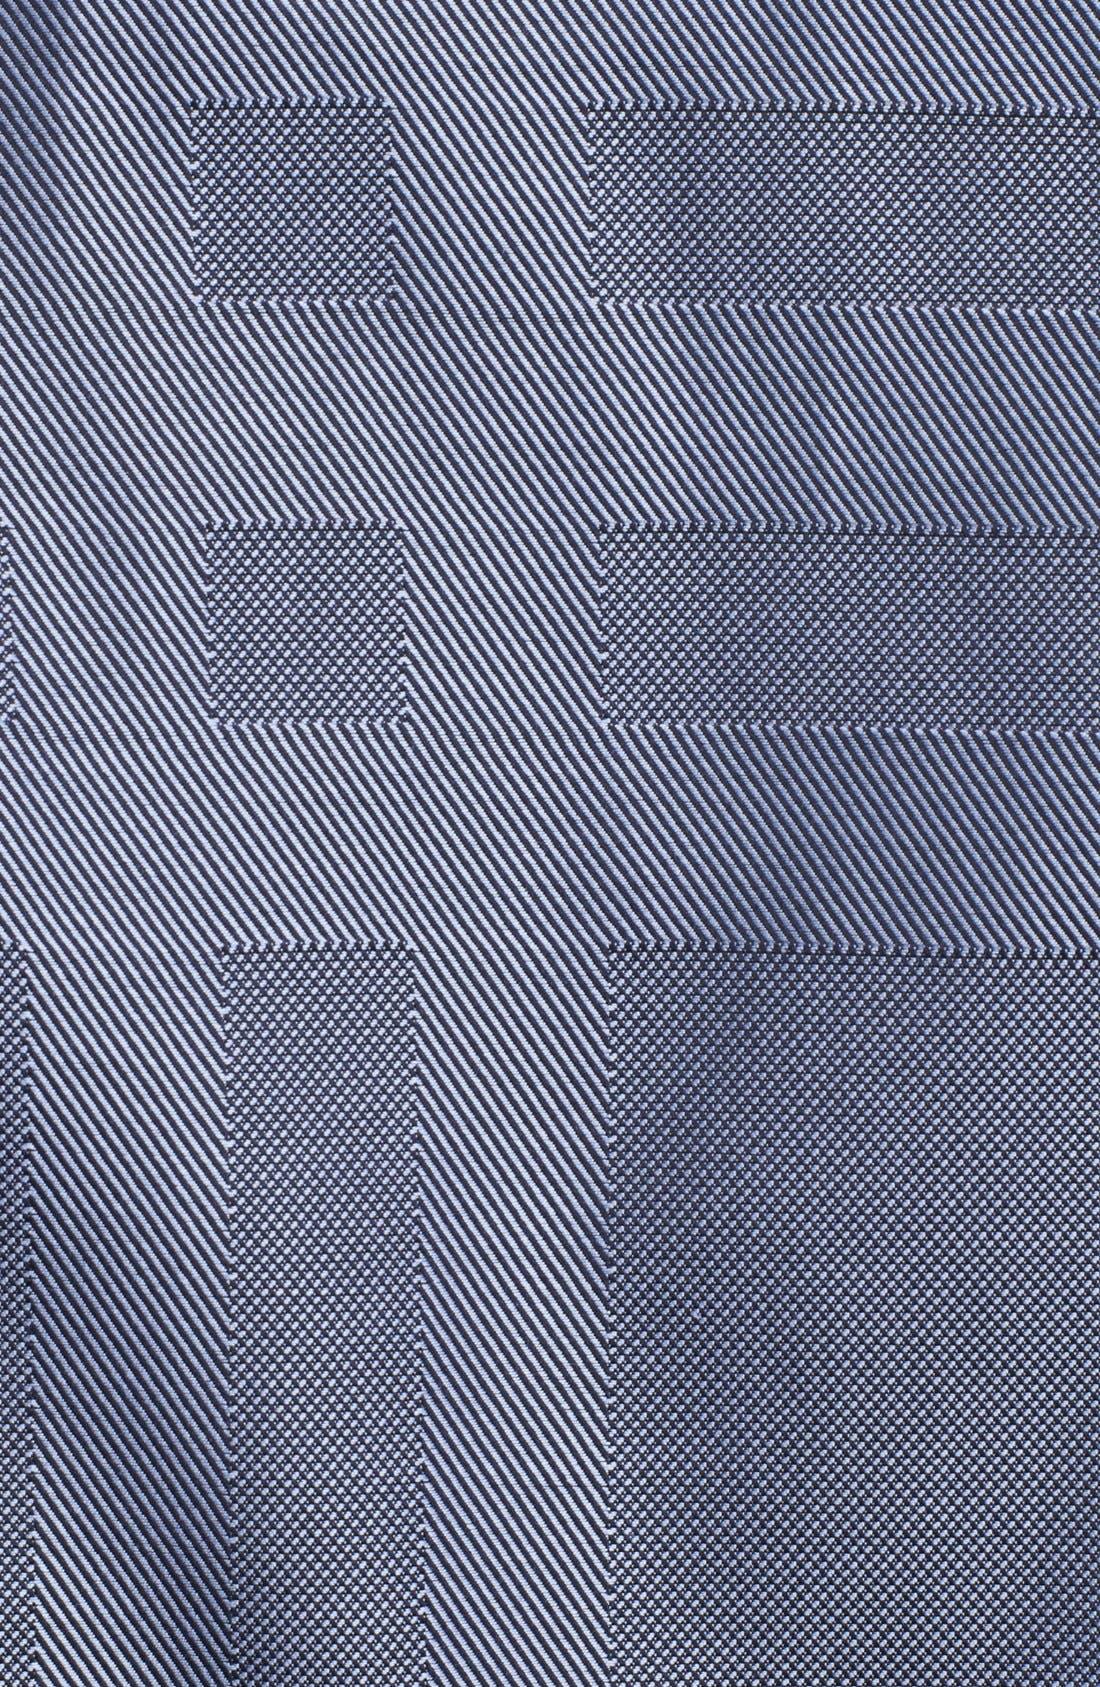 Alternate Image 2  - Burberry London 'Halesforth' Modern Fit Dress Shirt